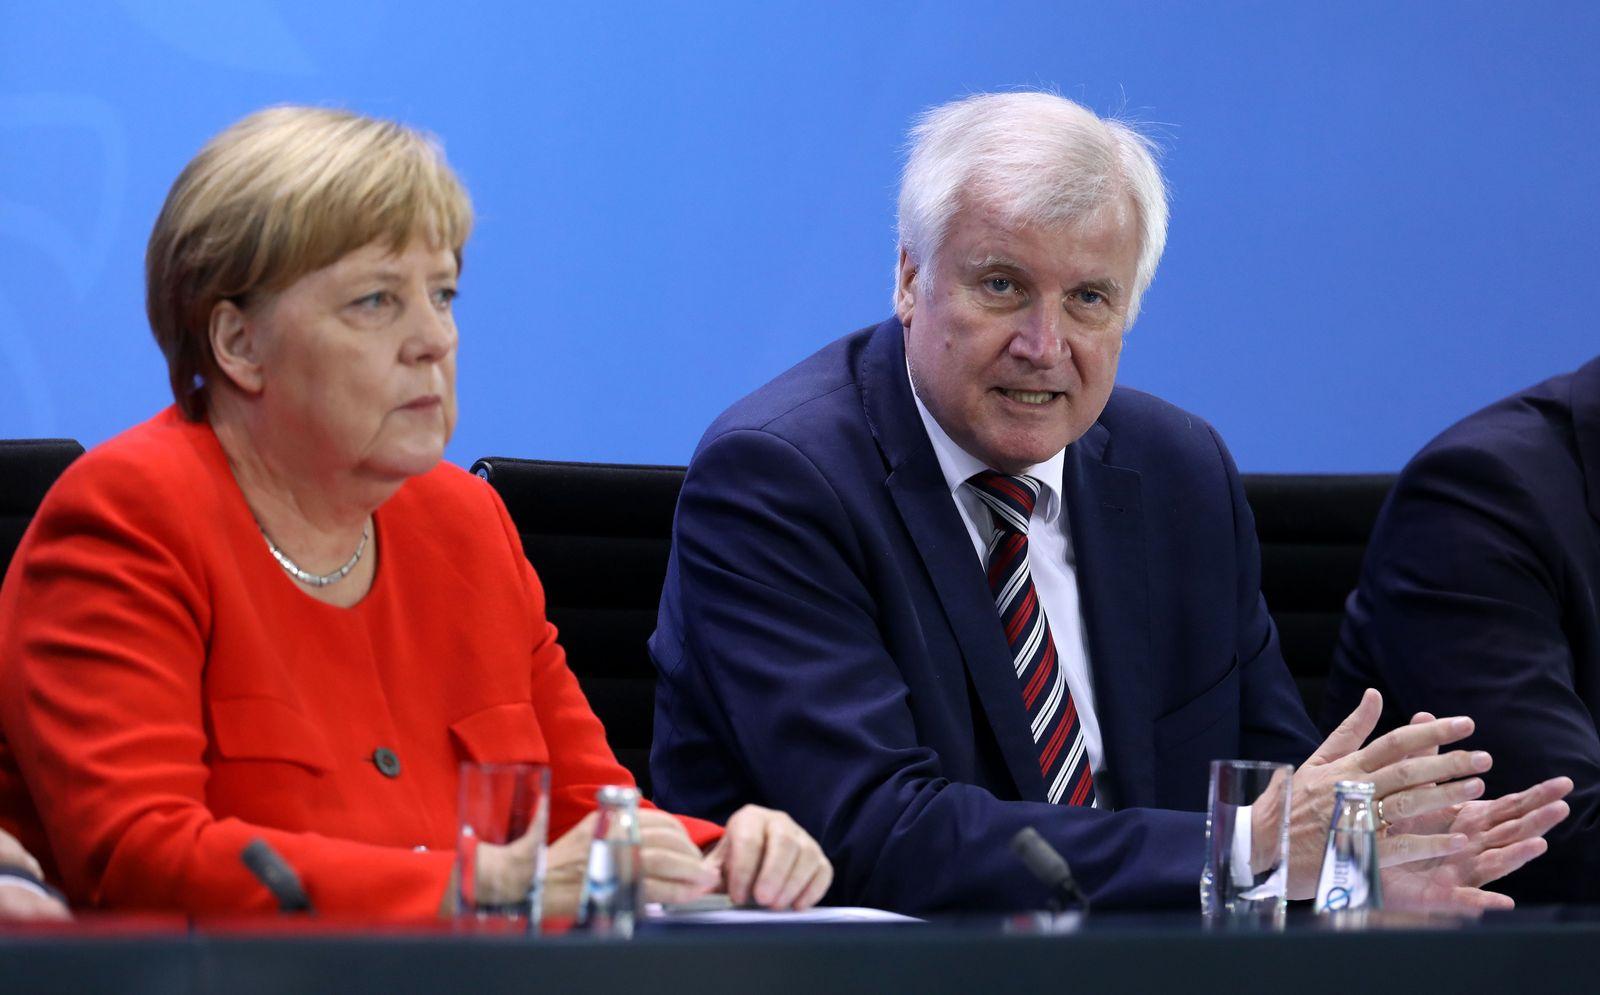 Merkel/ Seehofer